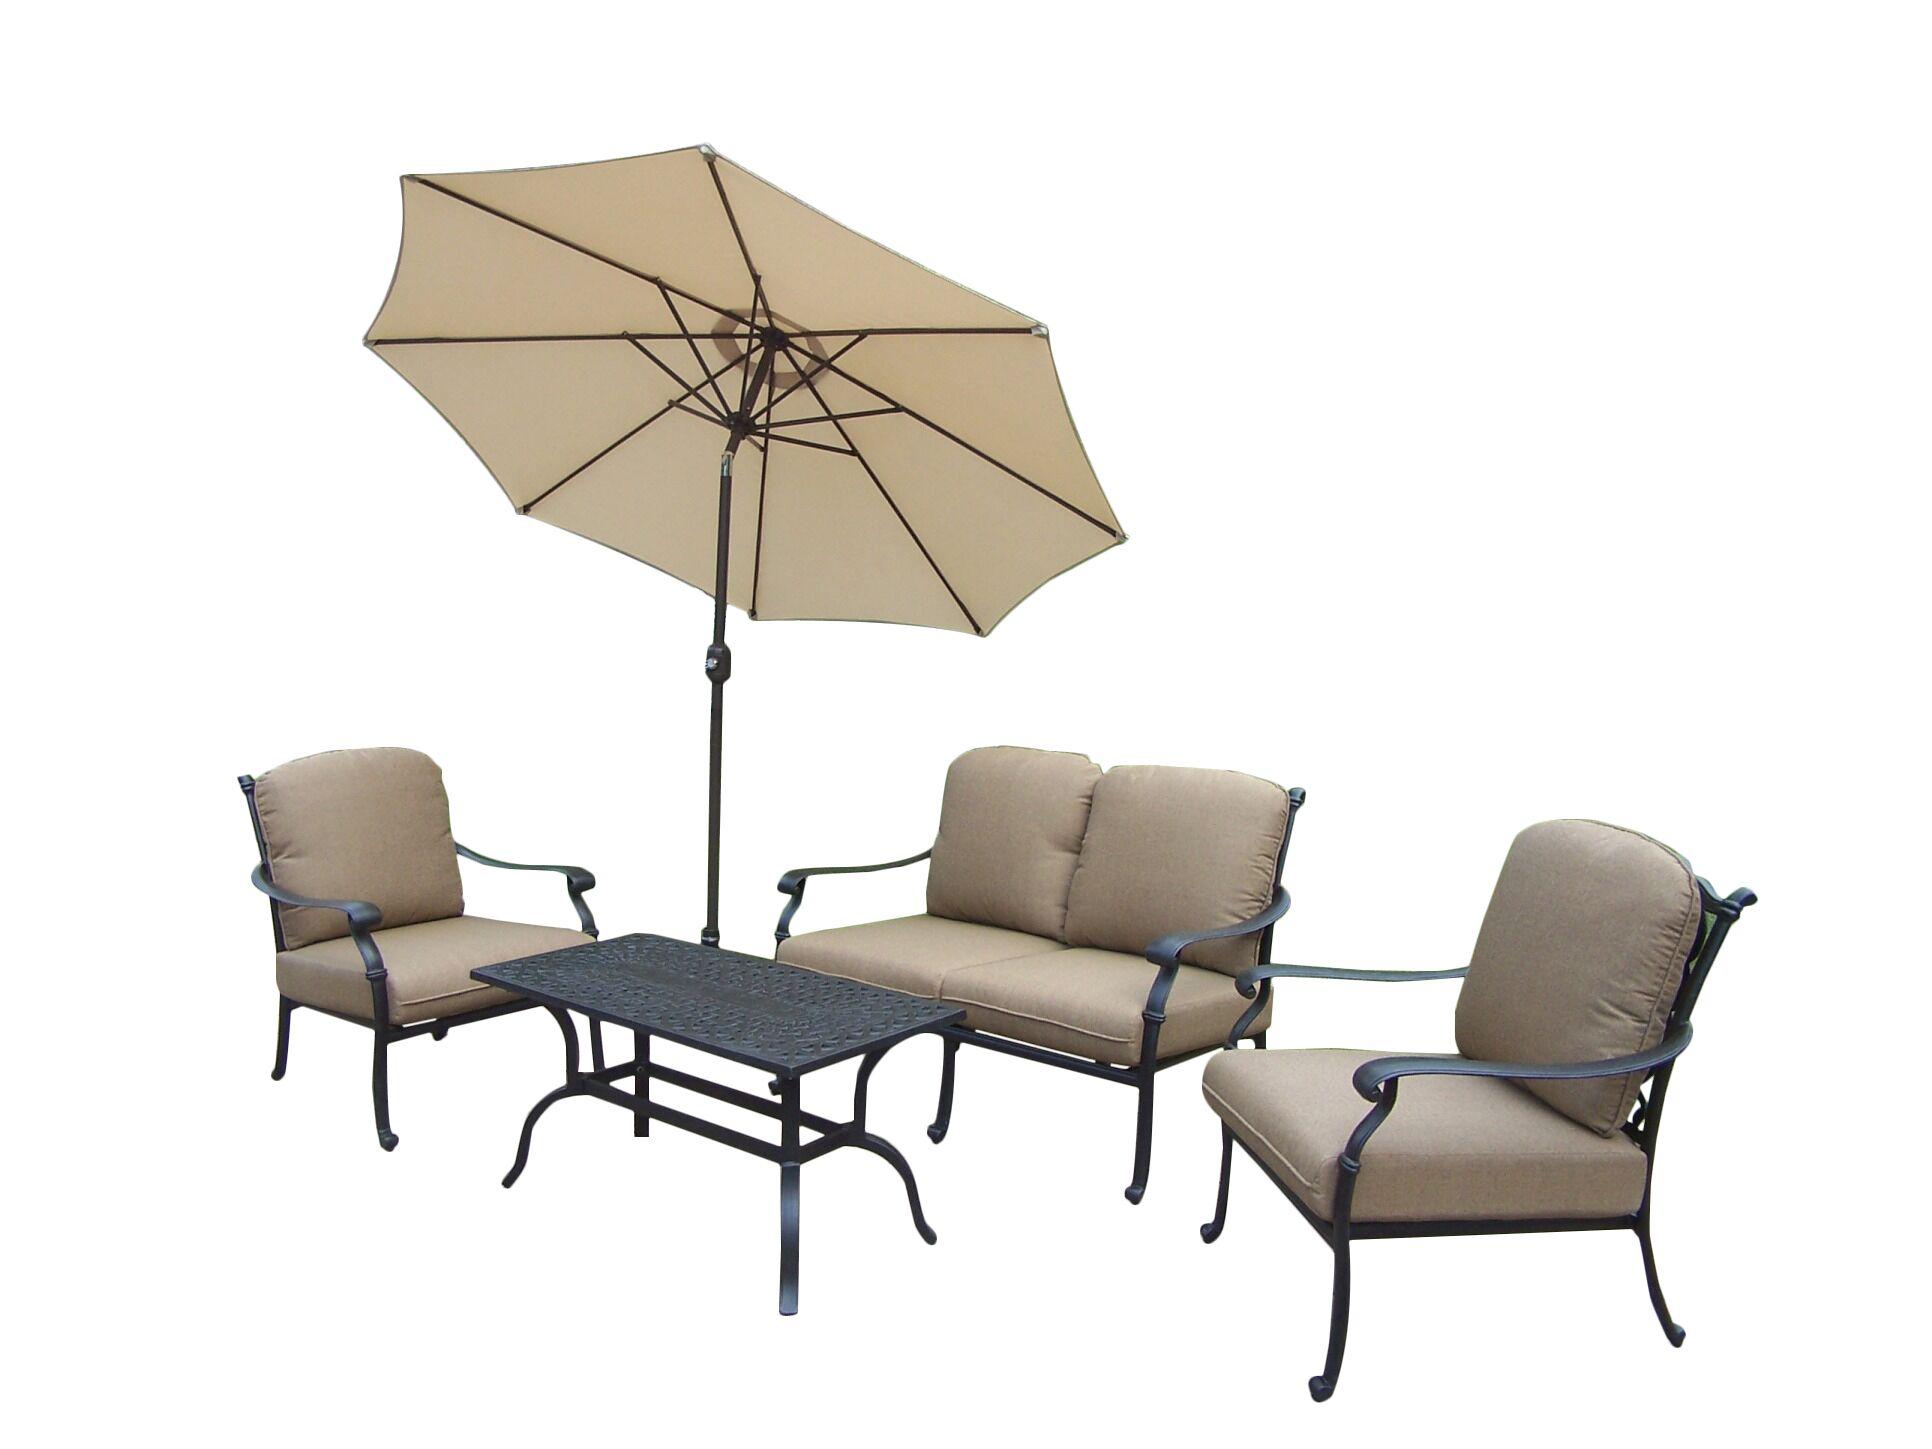 Bosch 5 Piece Sofa Set with Cushions